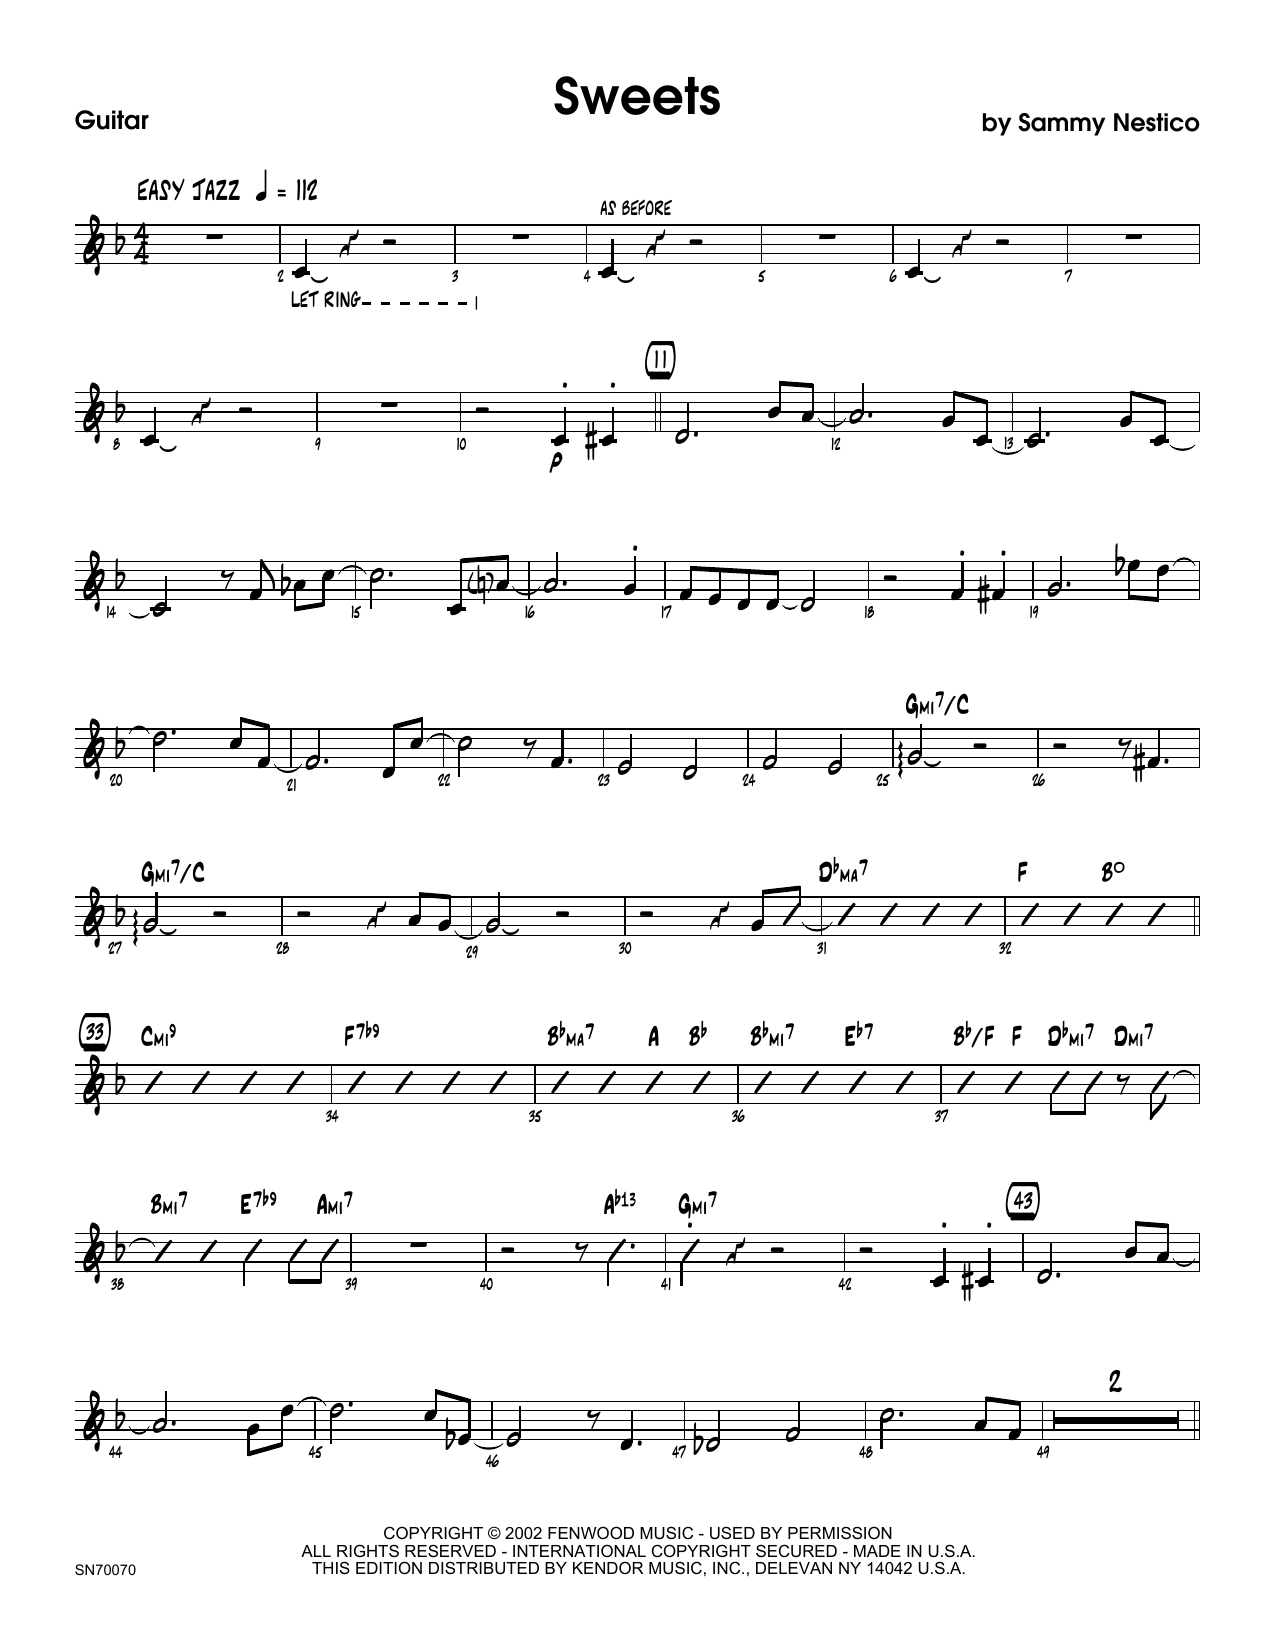 Sweets - Guitar Sheet Music